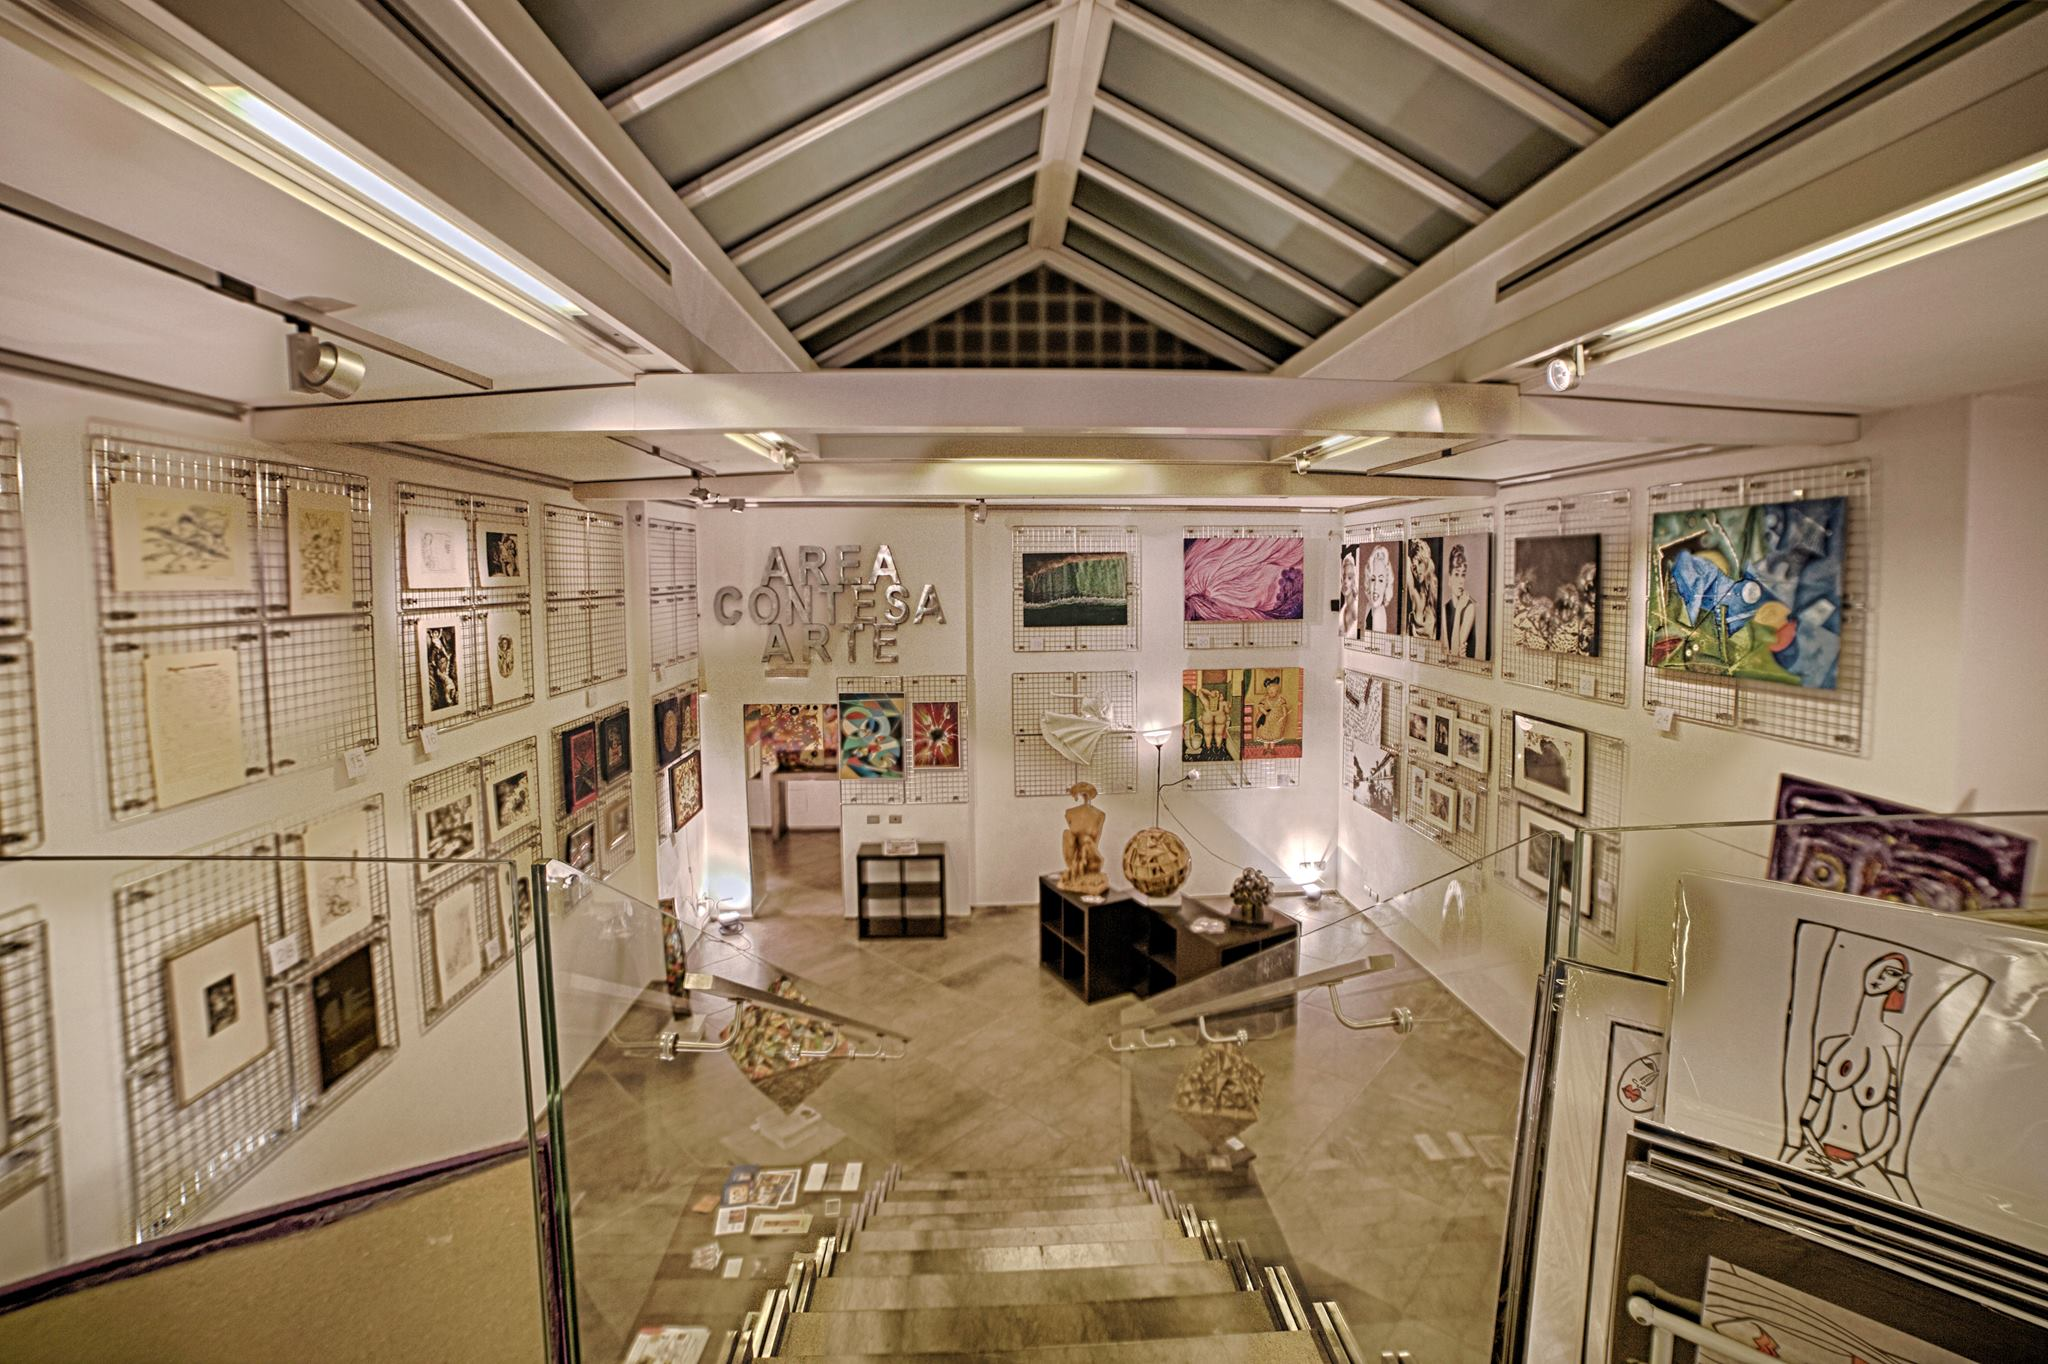 Area Contesa Arte - Galleria d'arte in via Margutta - Roma